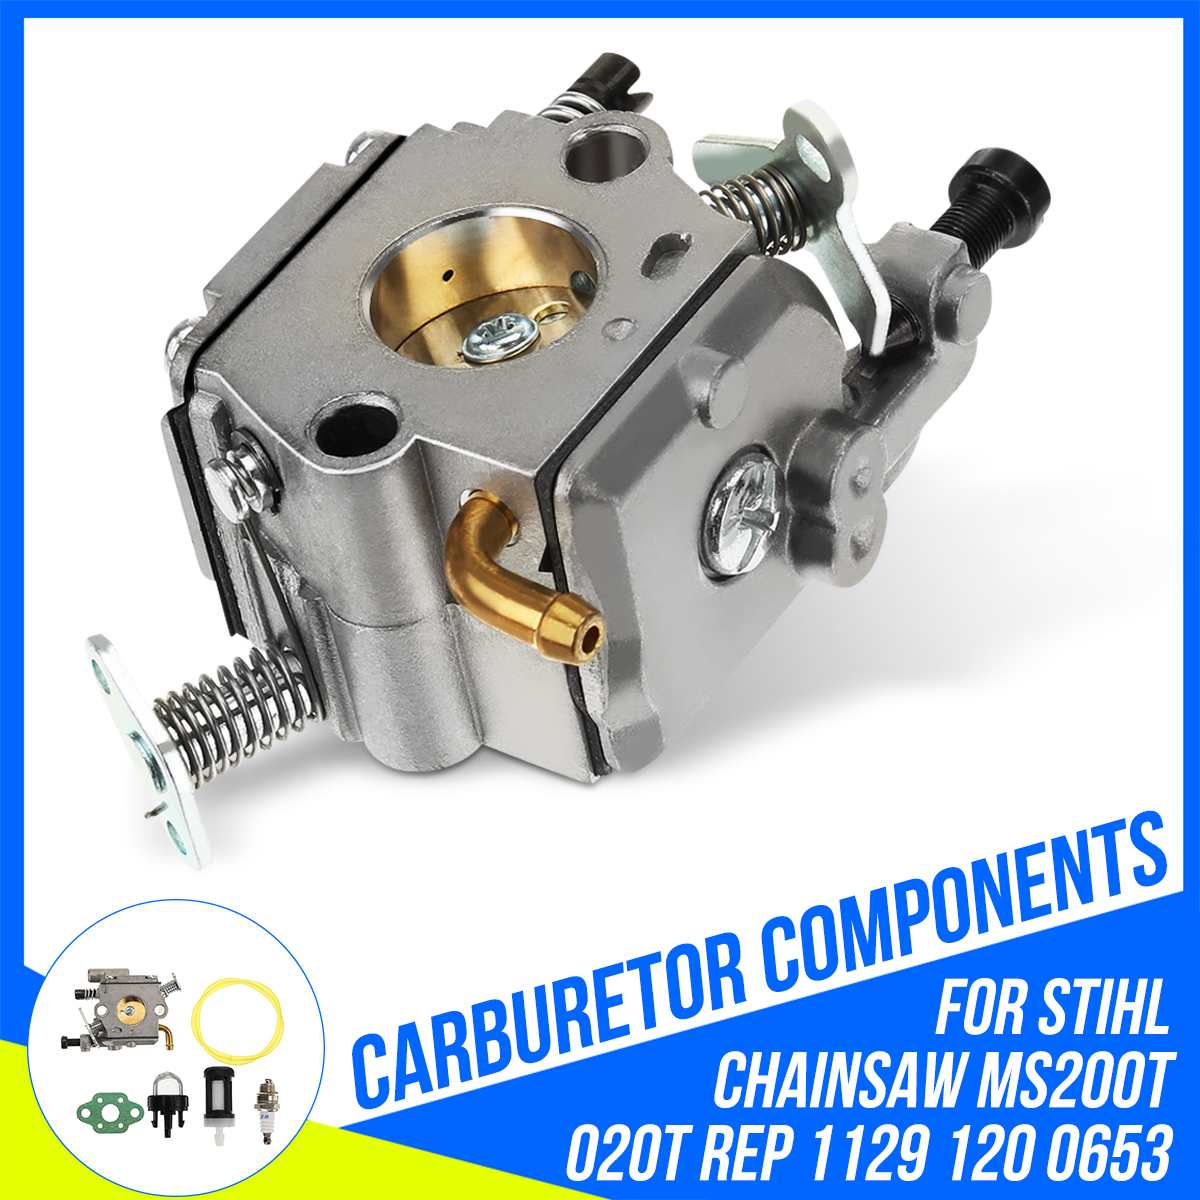 Carb Carburetor For Stihl MS200 MS200T 020T Chainsaw ZAMA C1Q S126B 11291200653 Fuel Supply System Carburetors Replacement Parts Carburetors     - title=